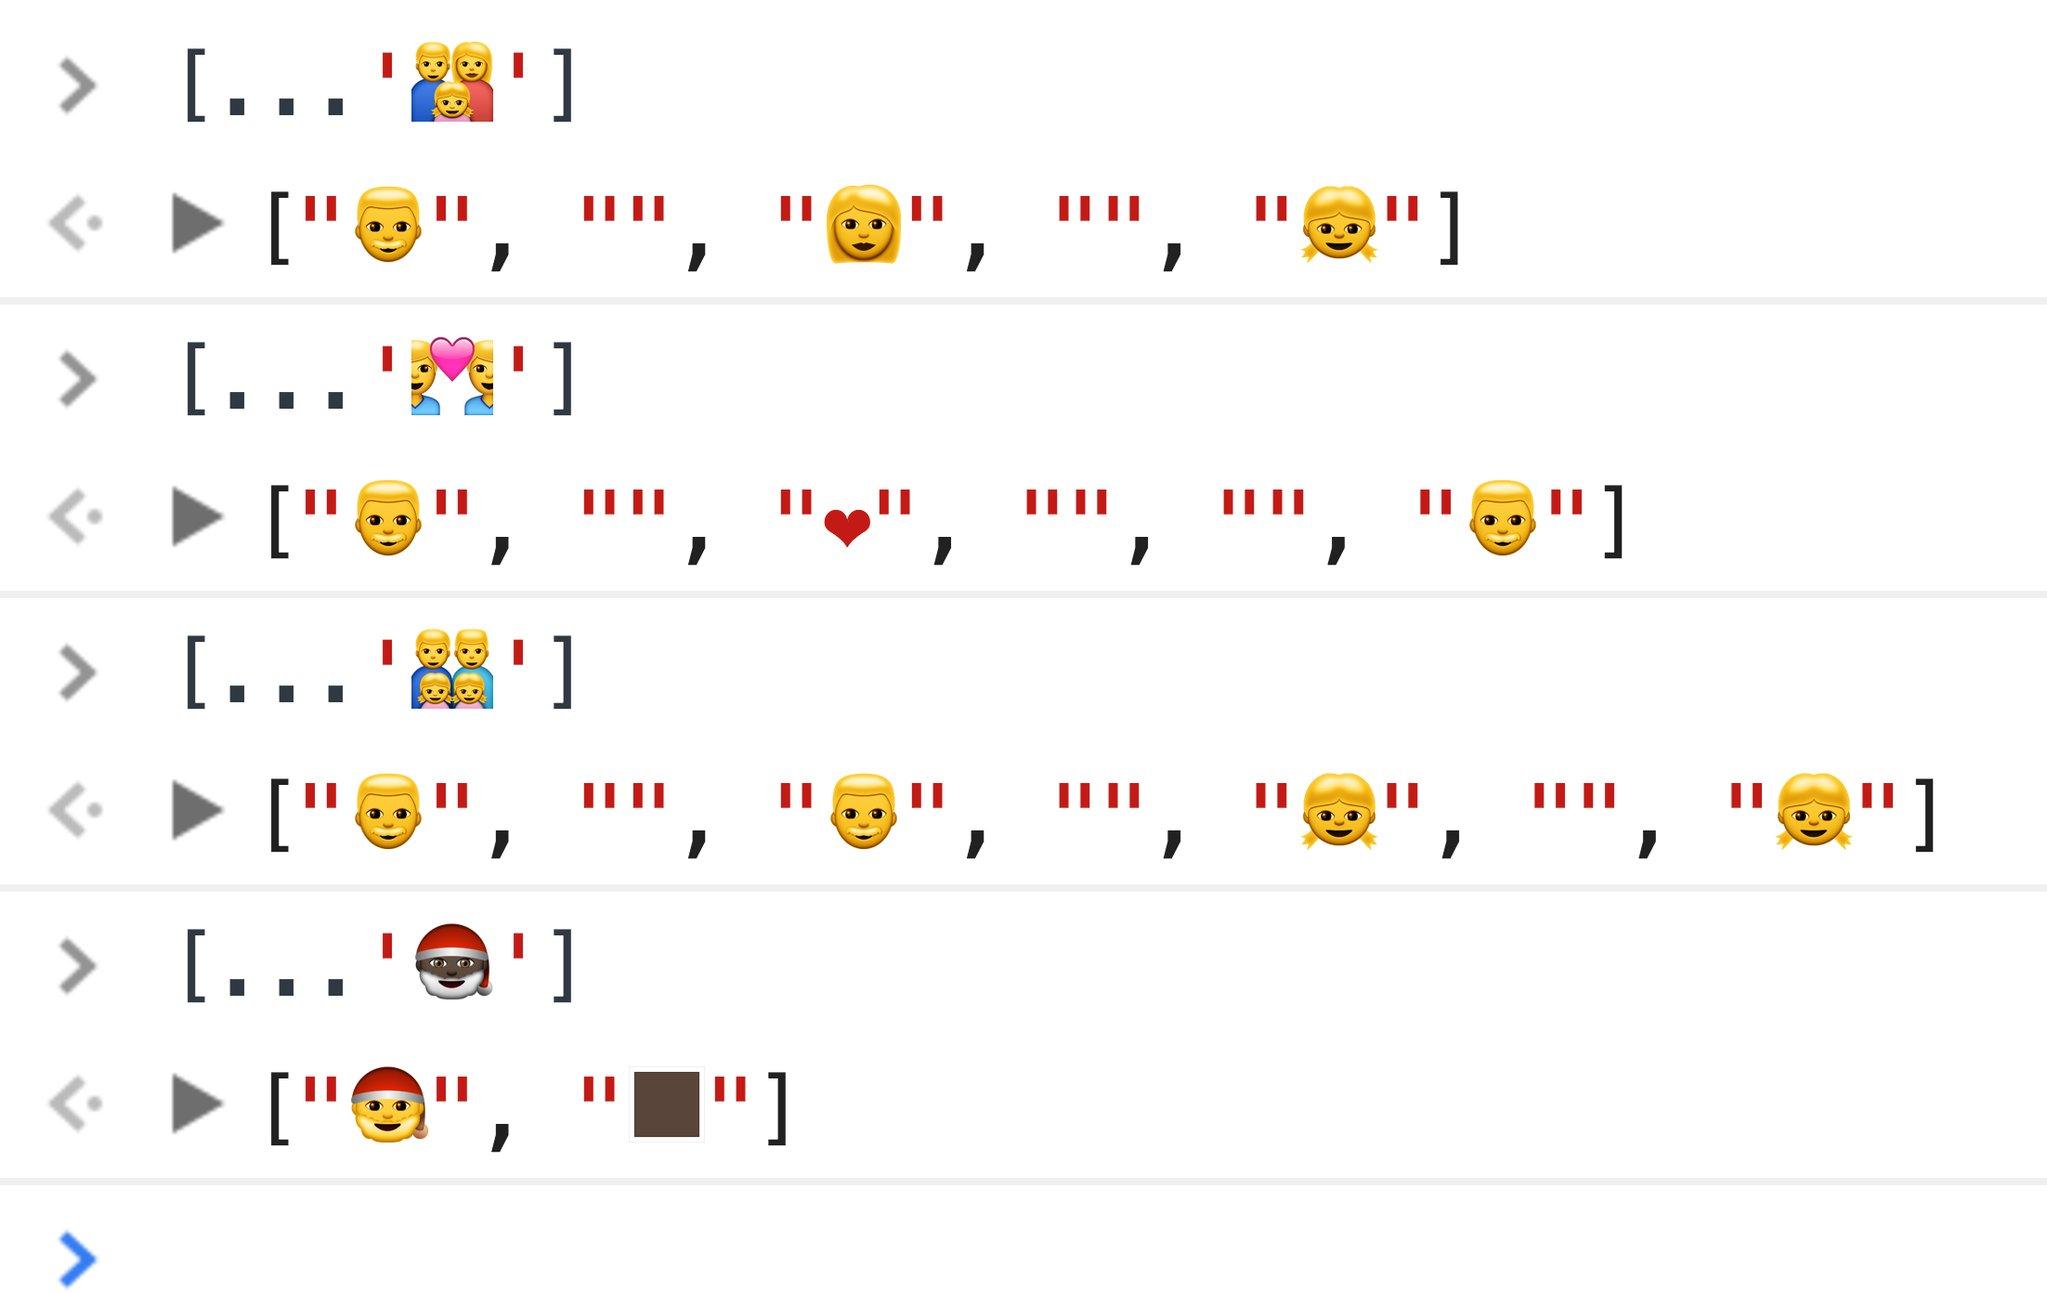 emoji-spread